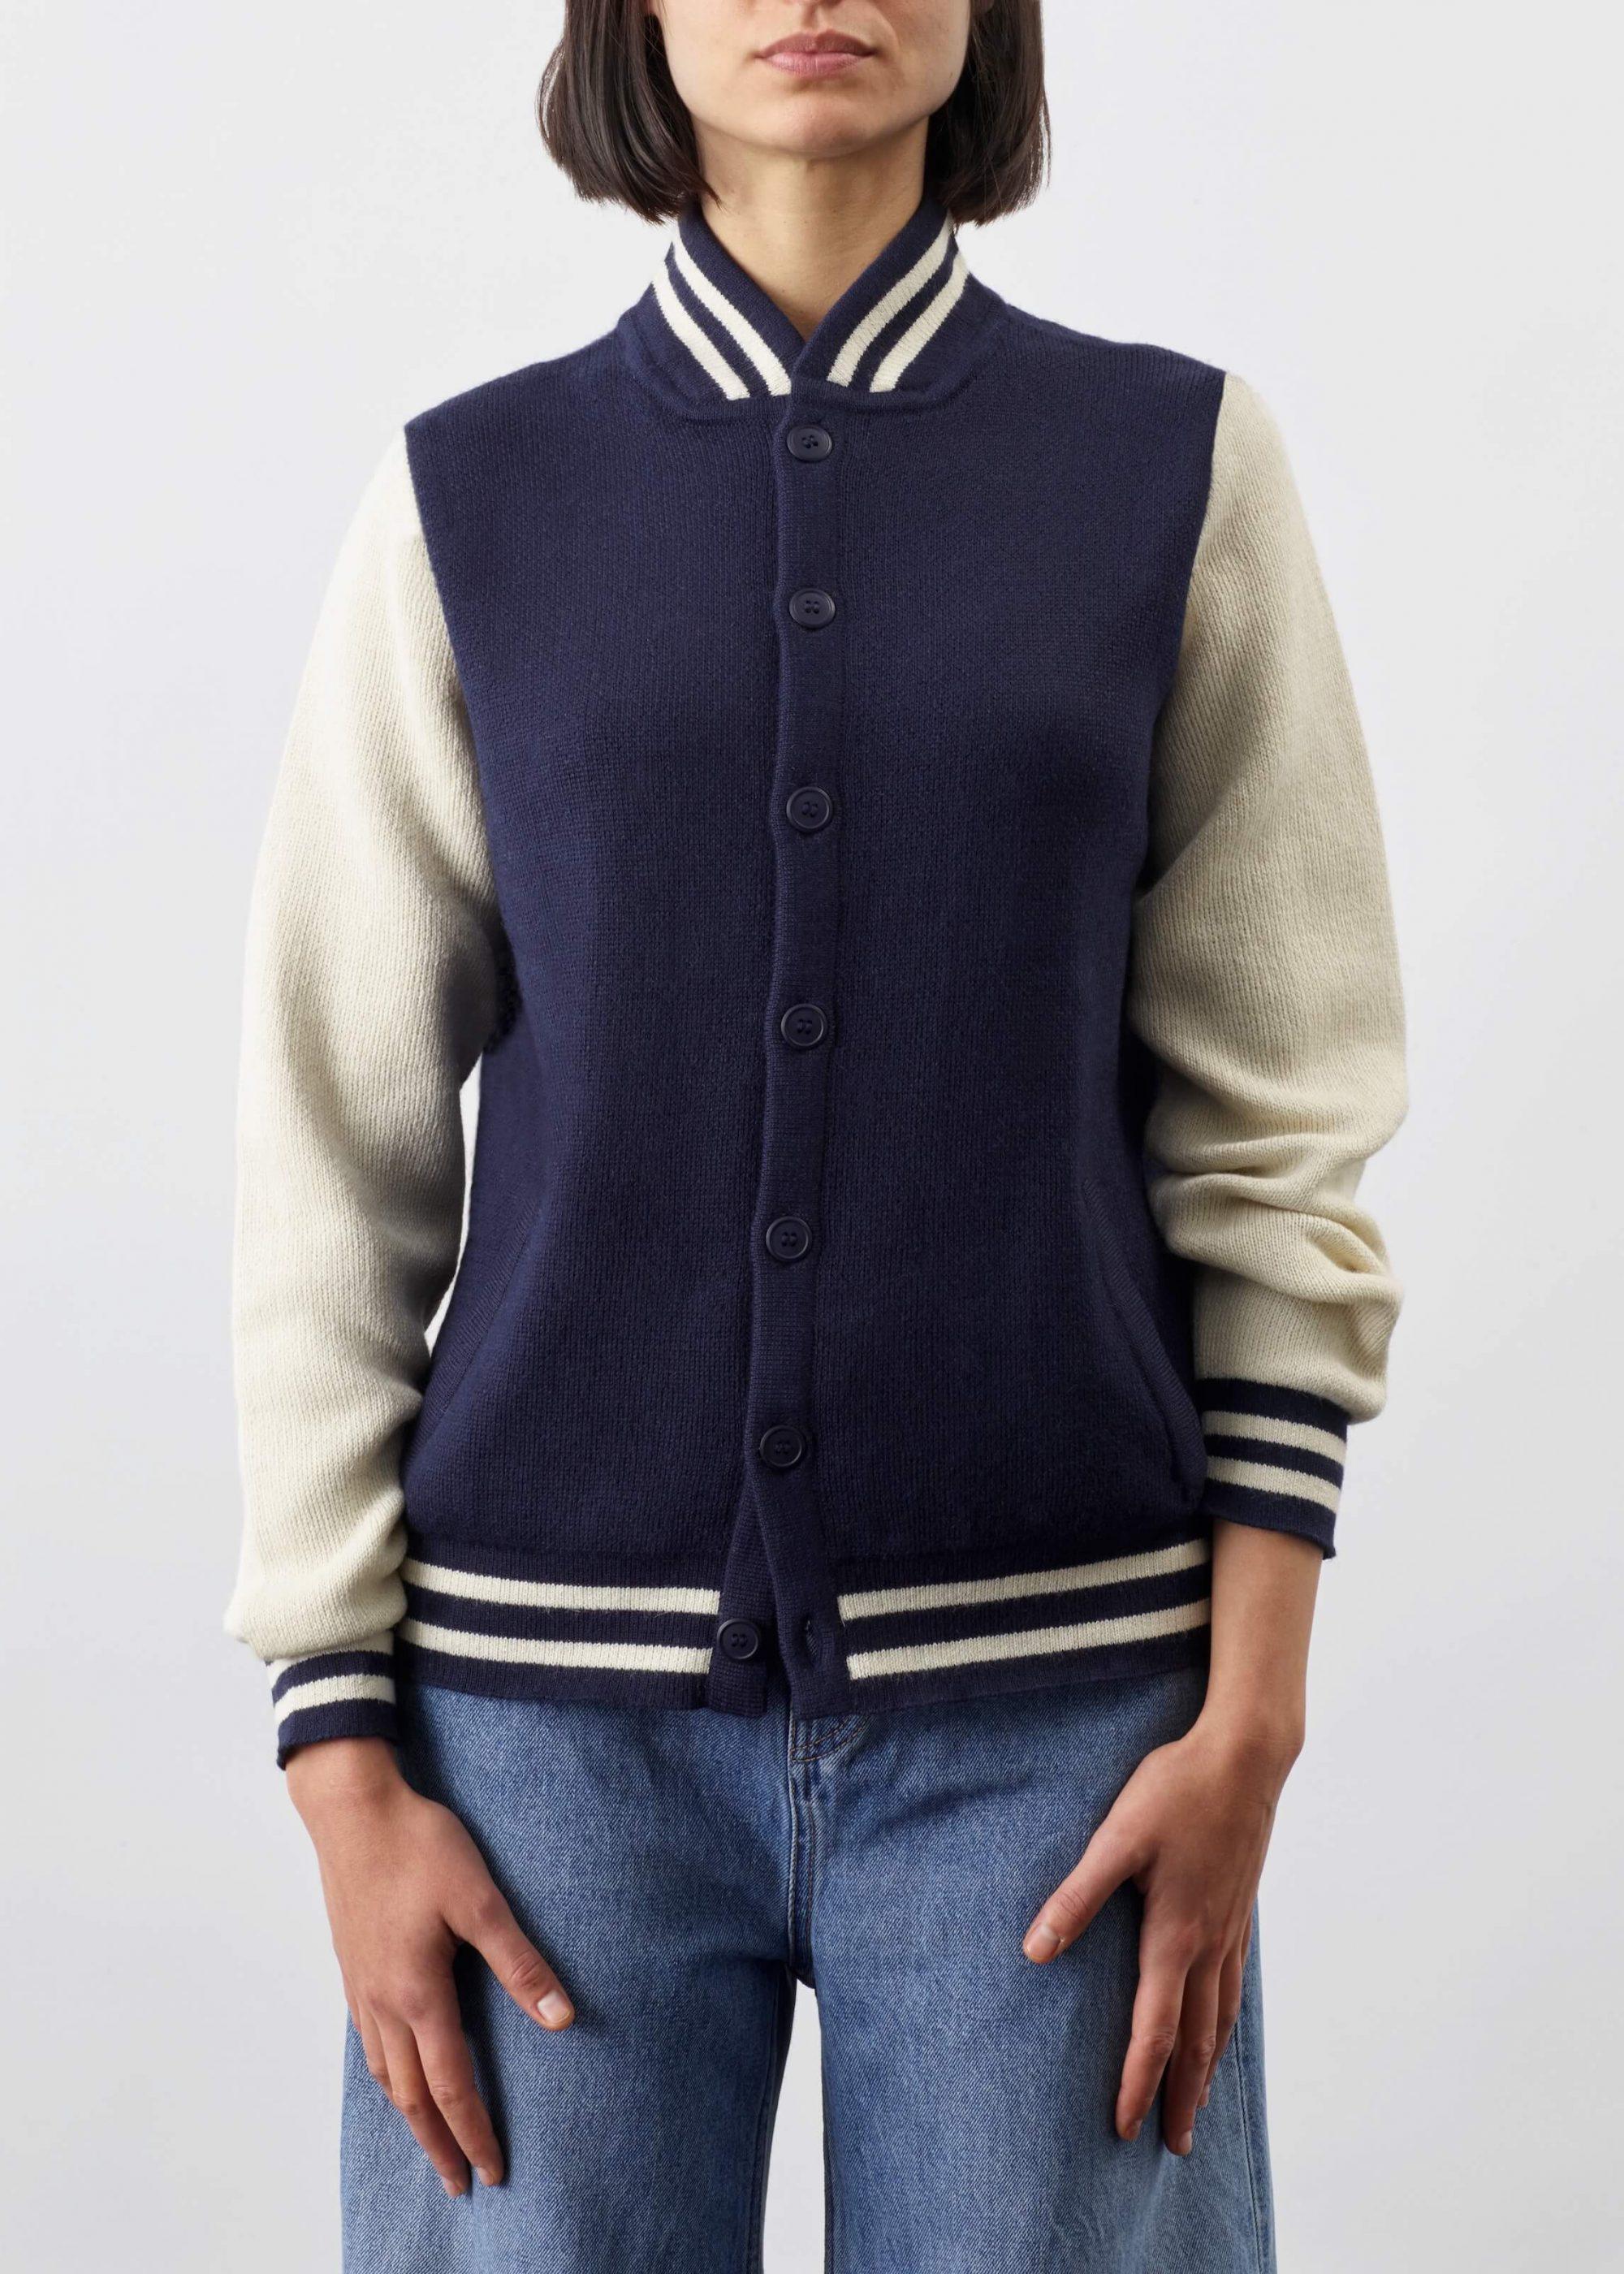 Product image for N° CKI1 Varsity Cardigan